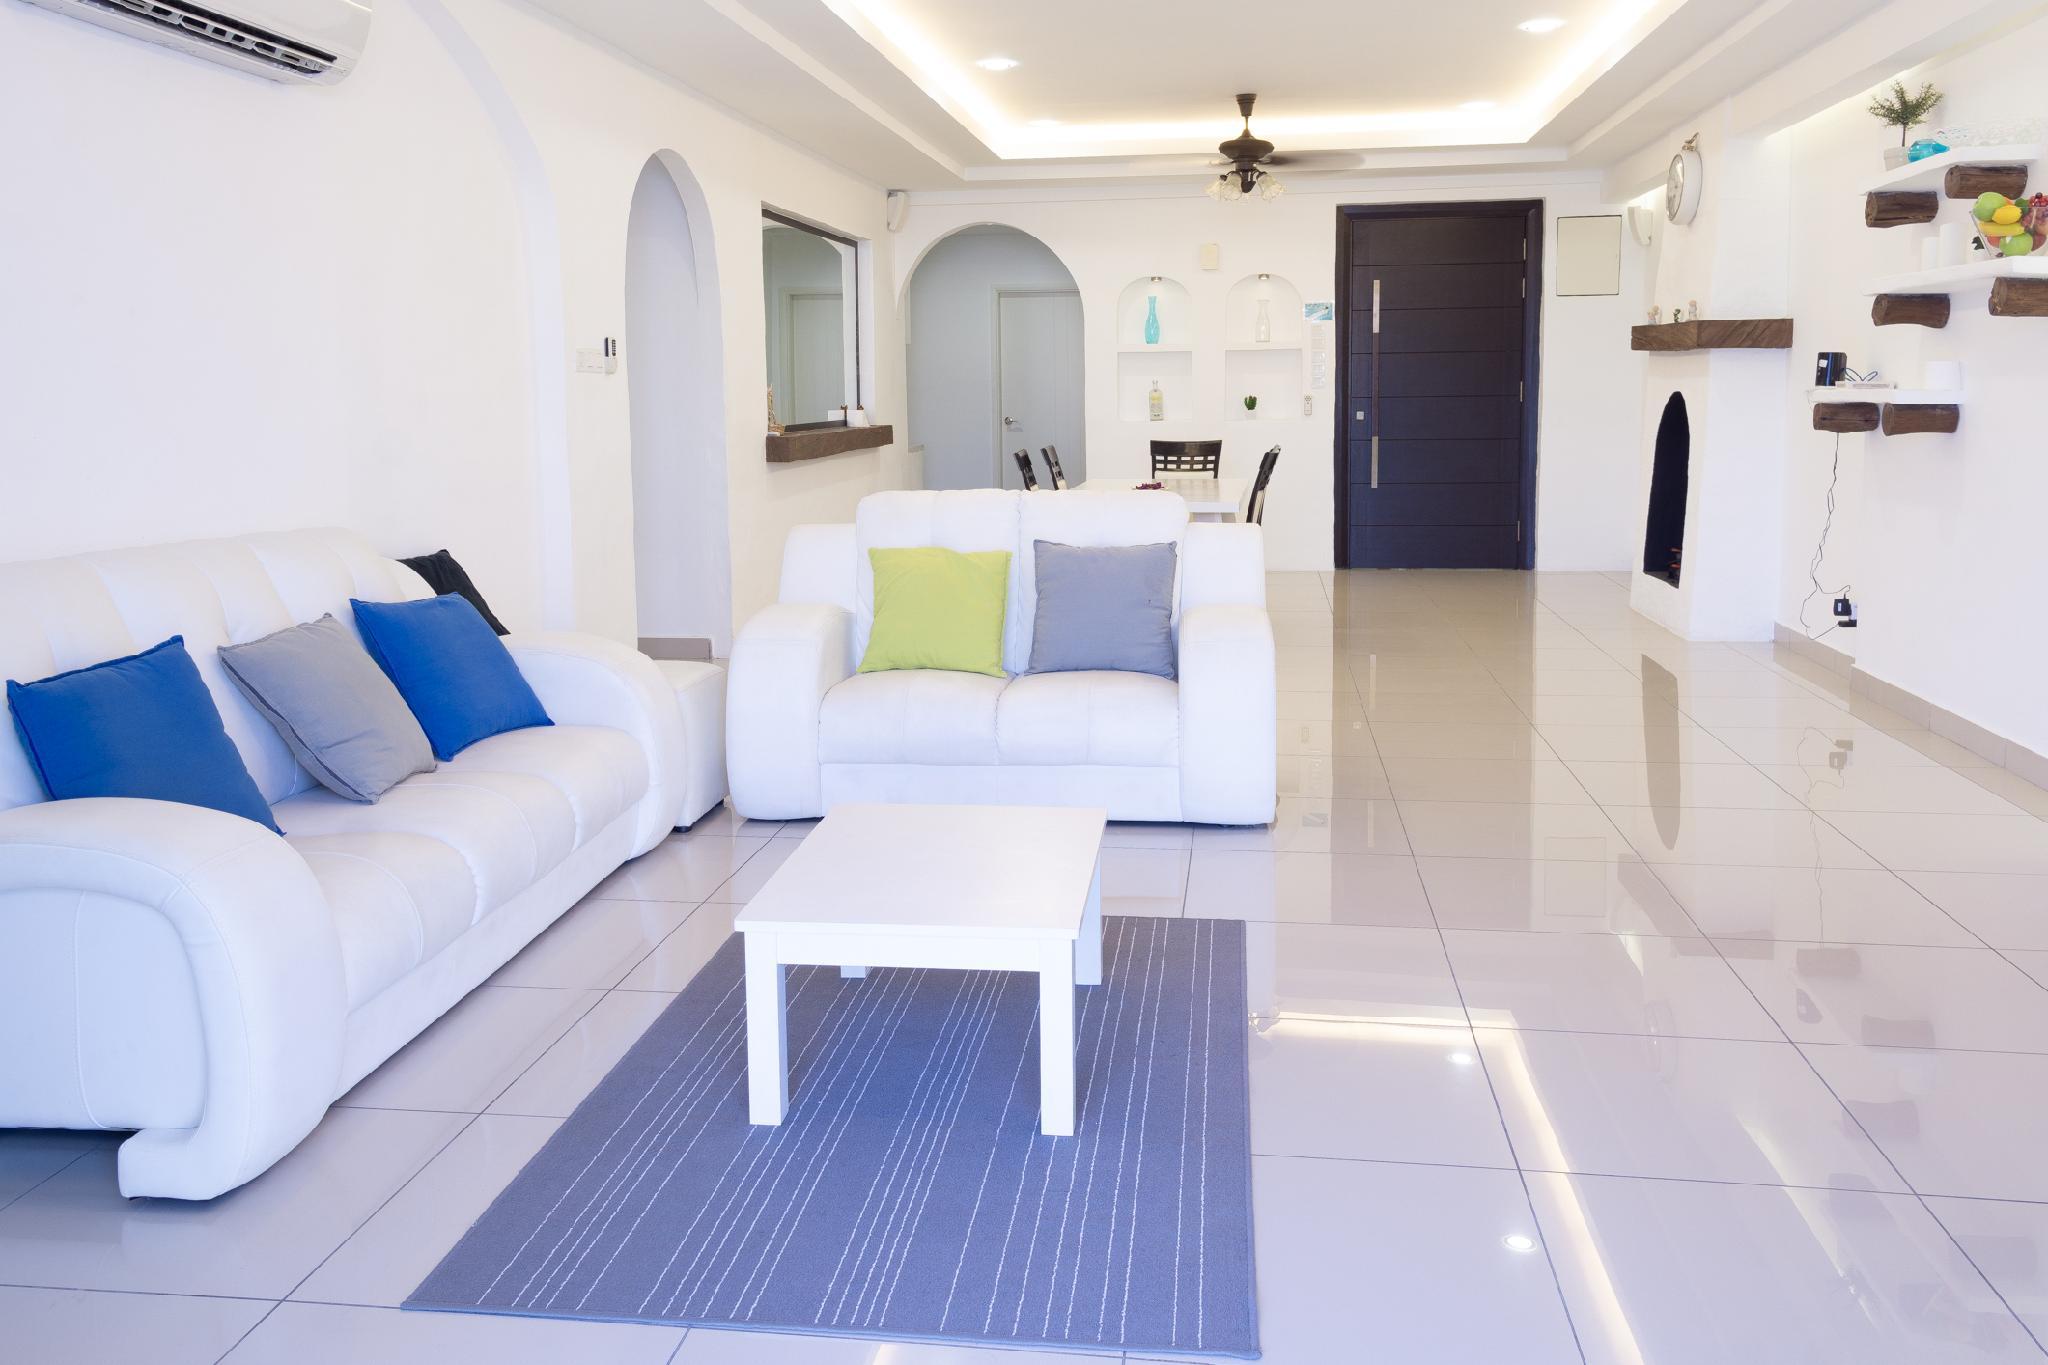 Santorini Seaview Holiday Home @ Queensbay